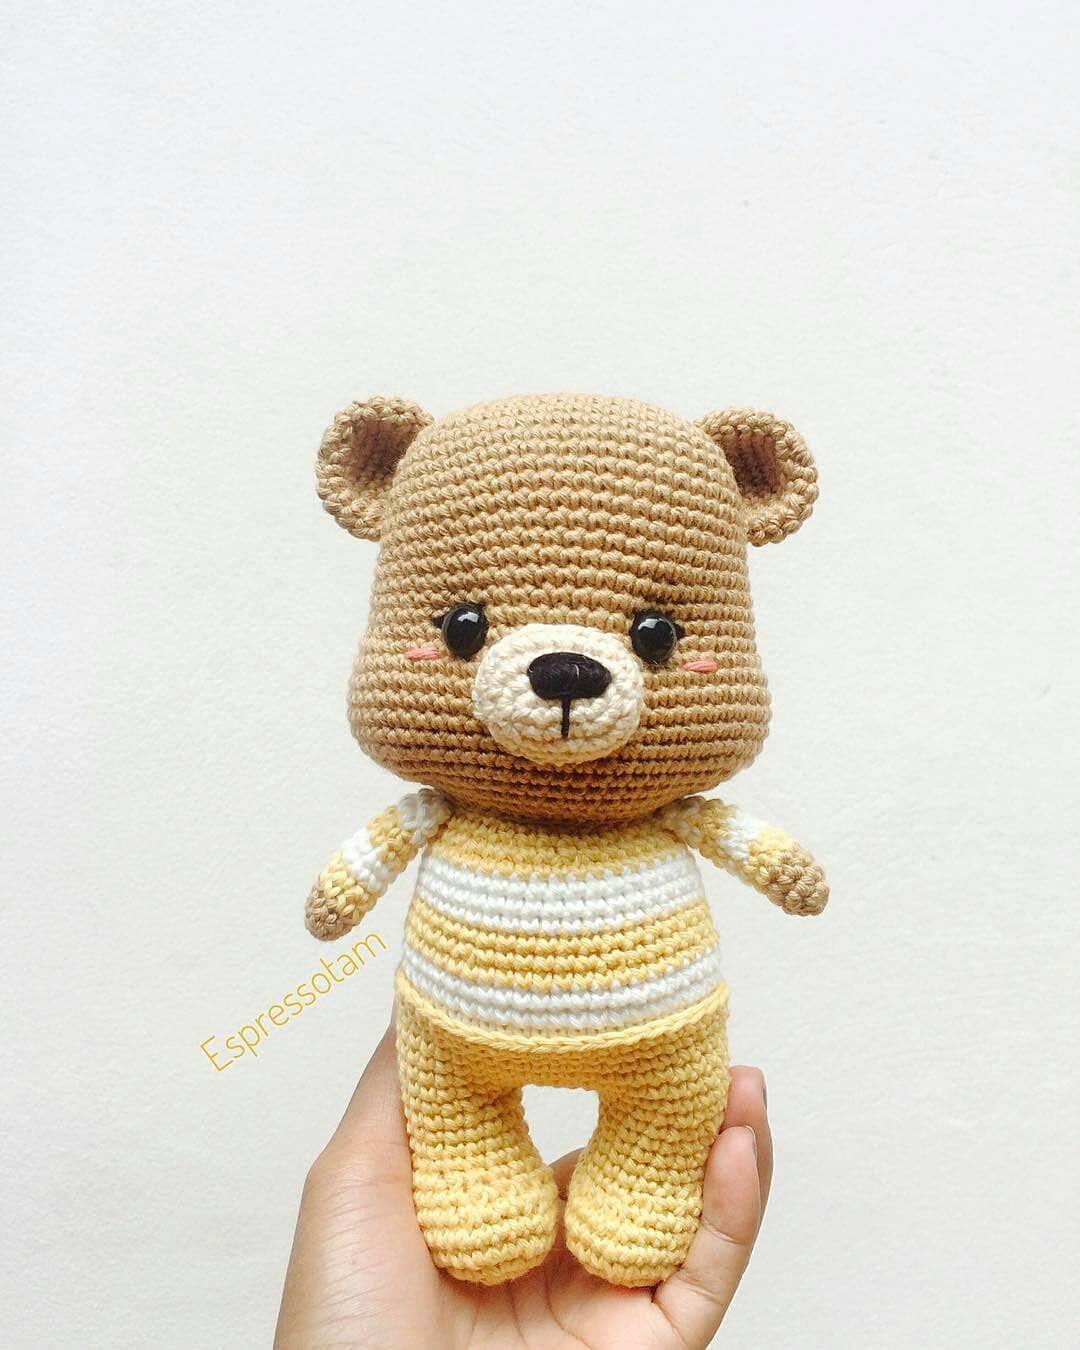 Regrann from @tamtam_ami - #bear #teddybear #amigurumi #amigurumitoy ...